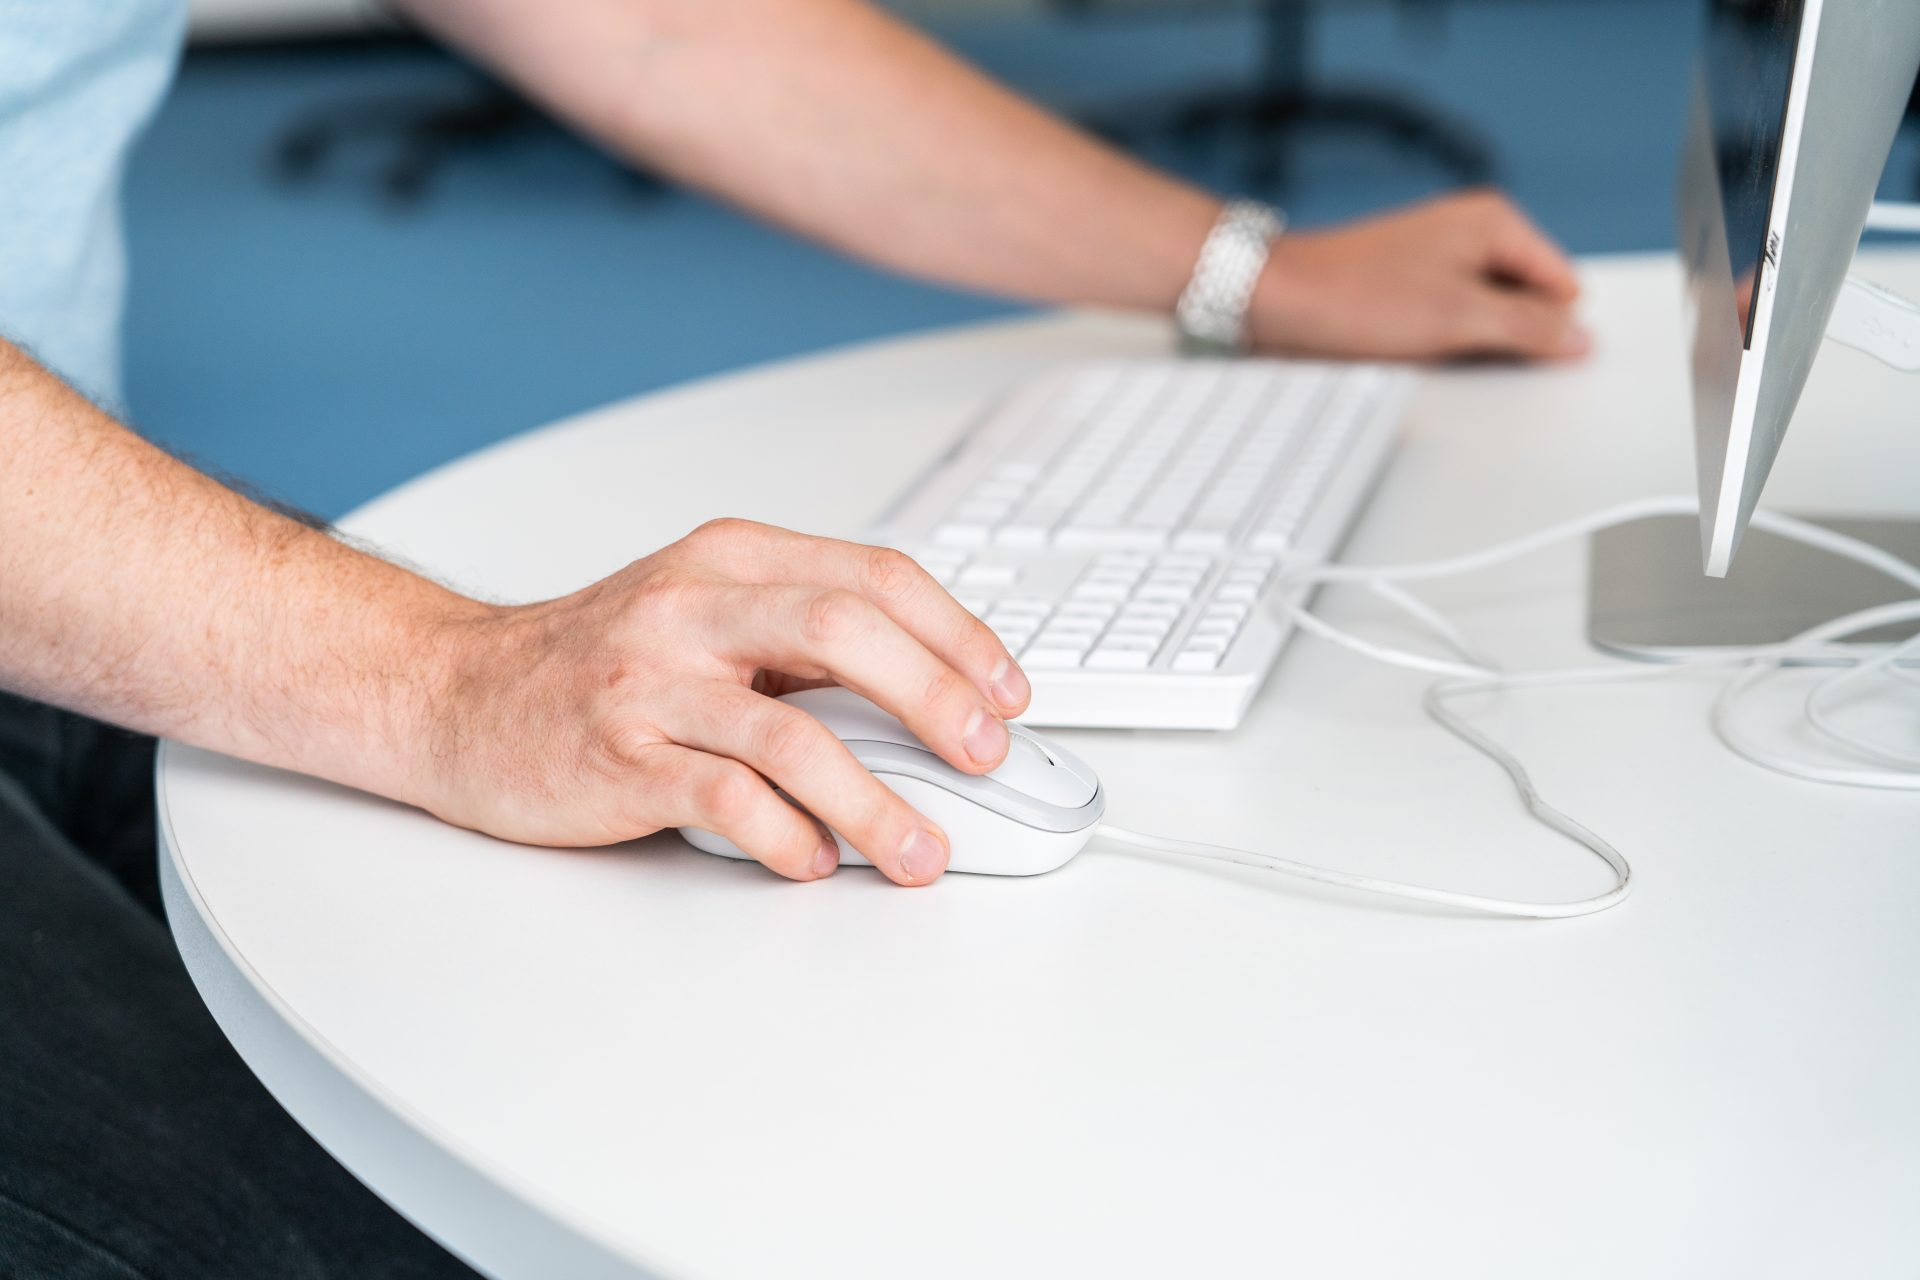 using a computer, ecommerce, wordpress